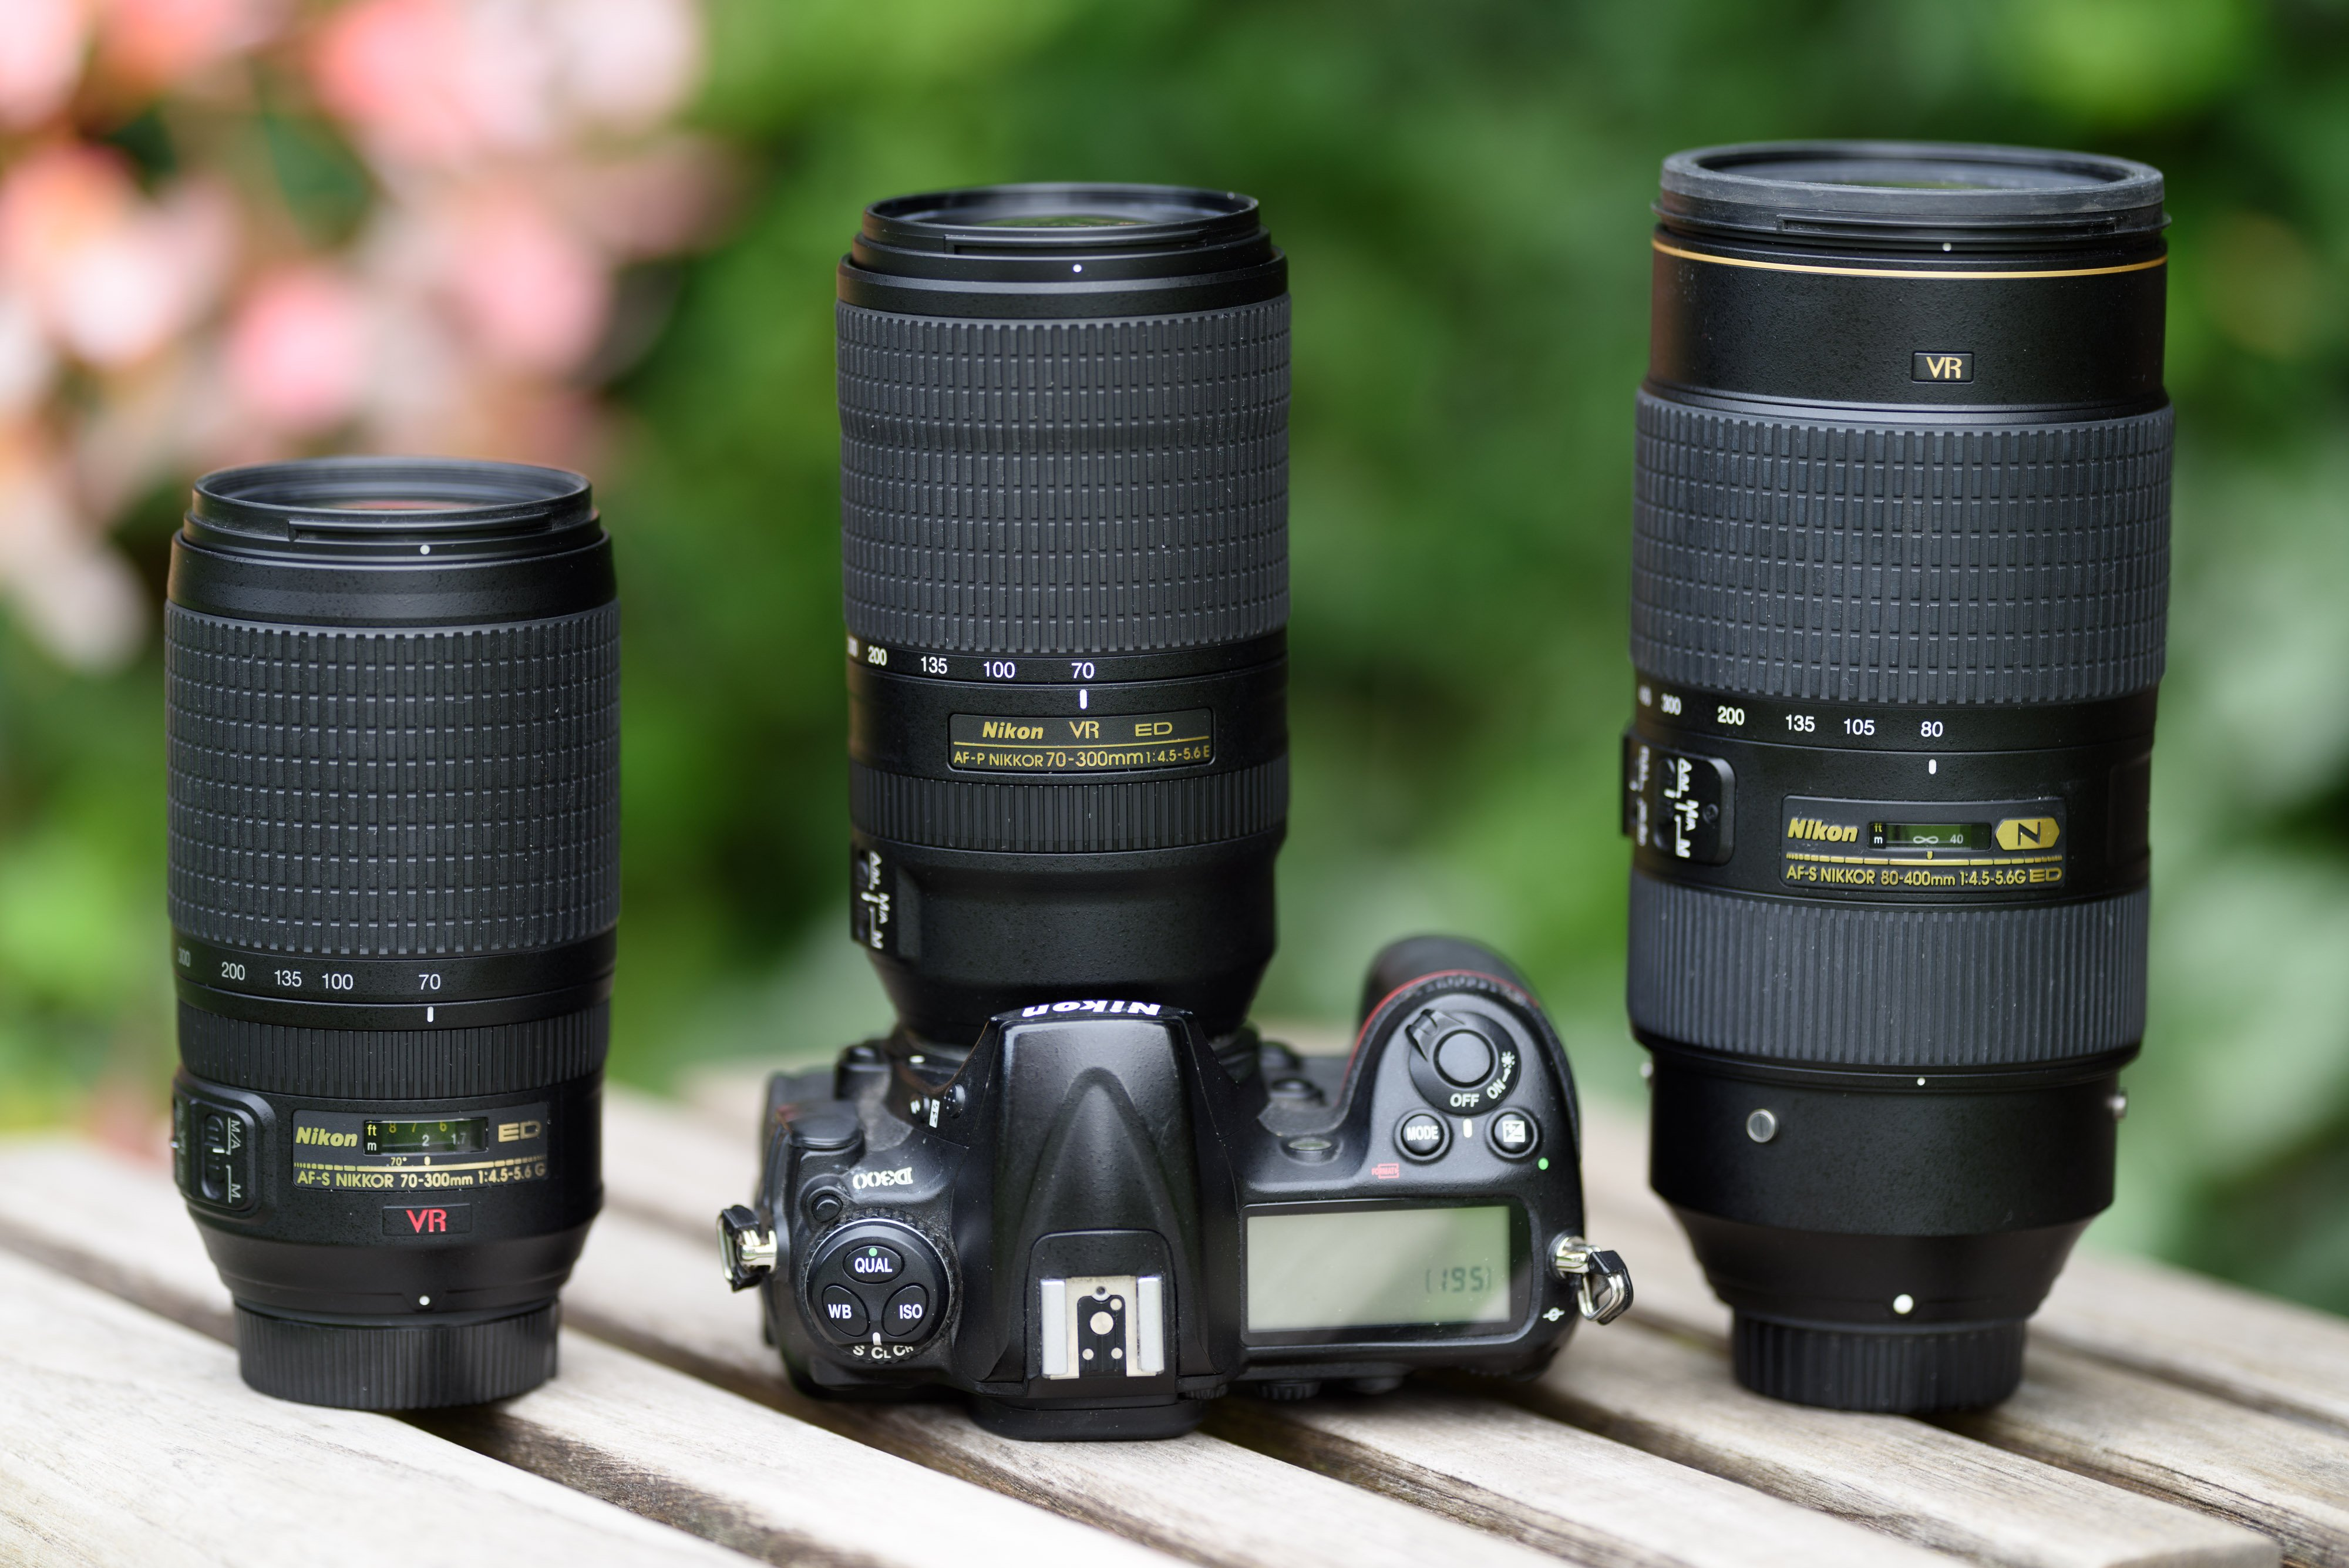 Nikon Af P 70 300mm F4 5 5 6e Vr Review Cameralabs